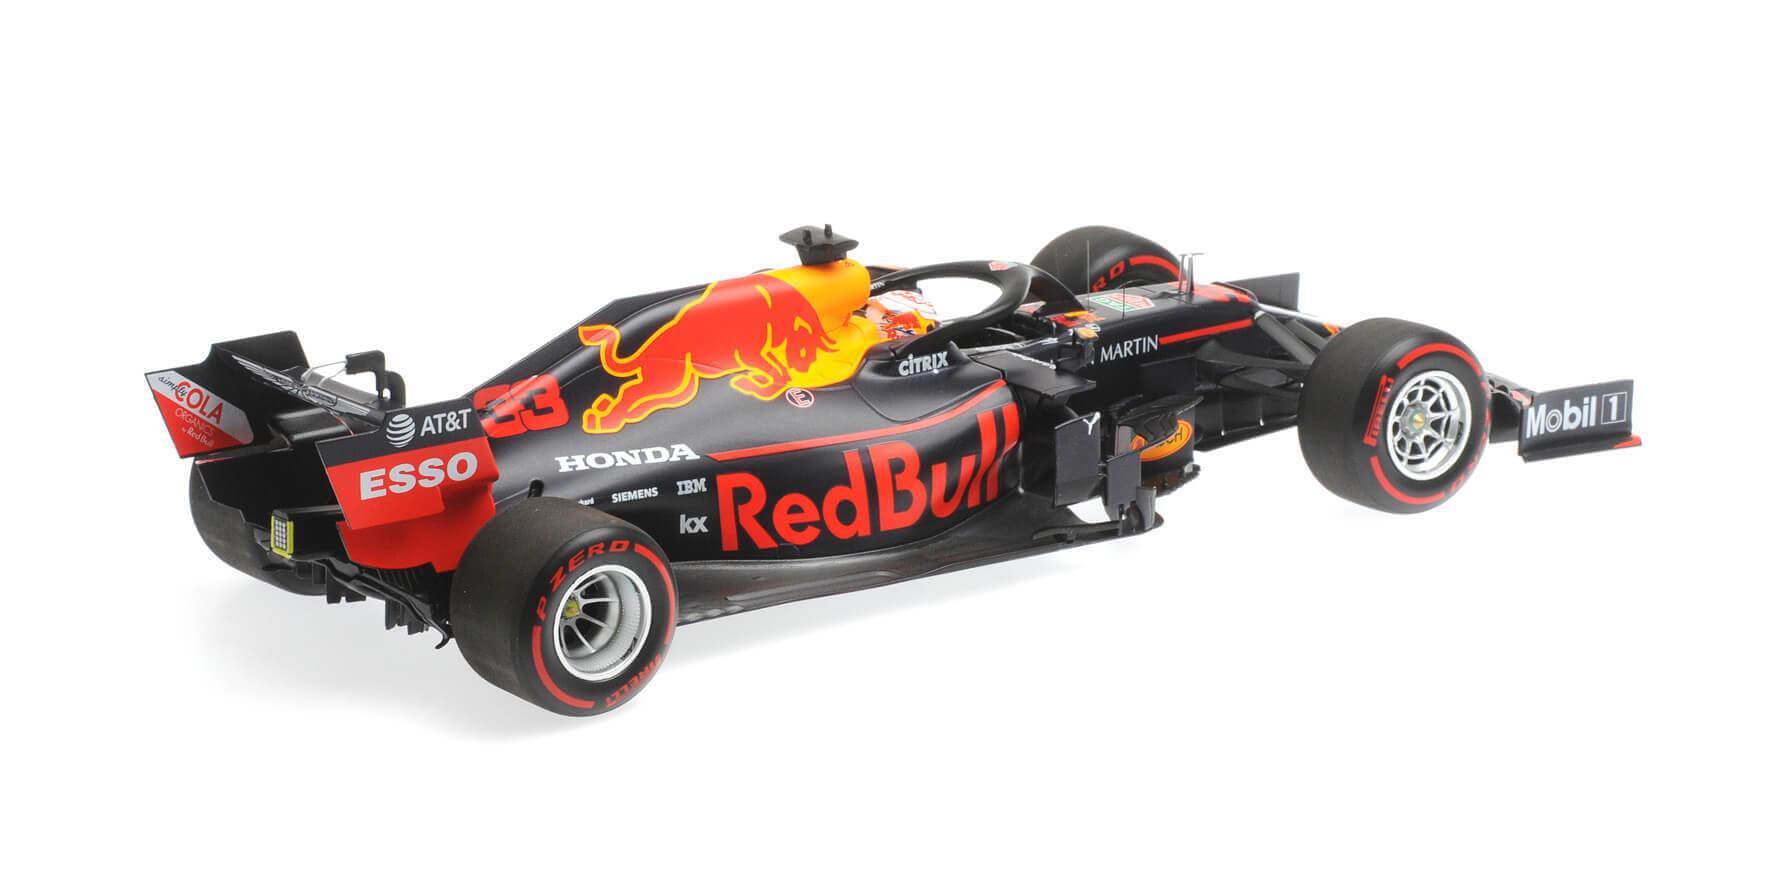 Minichamps Max Verstappen raceauto RB15 1:18 | Minichamps | 2019